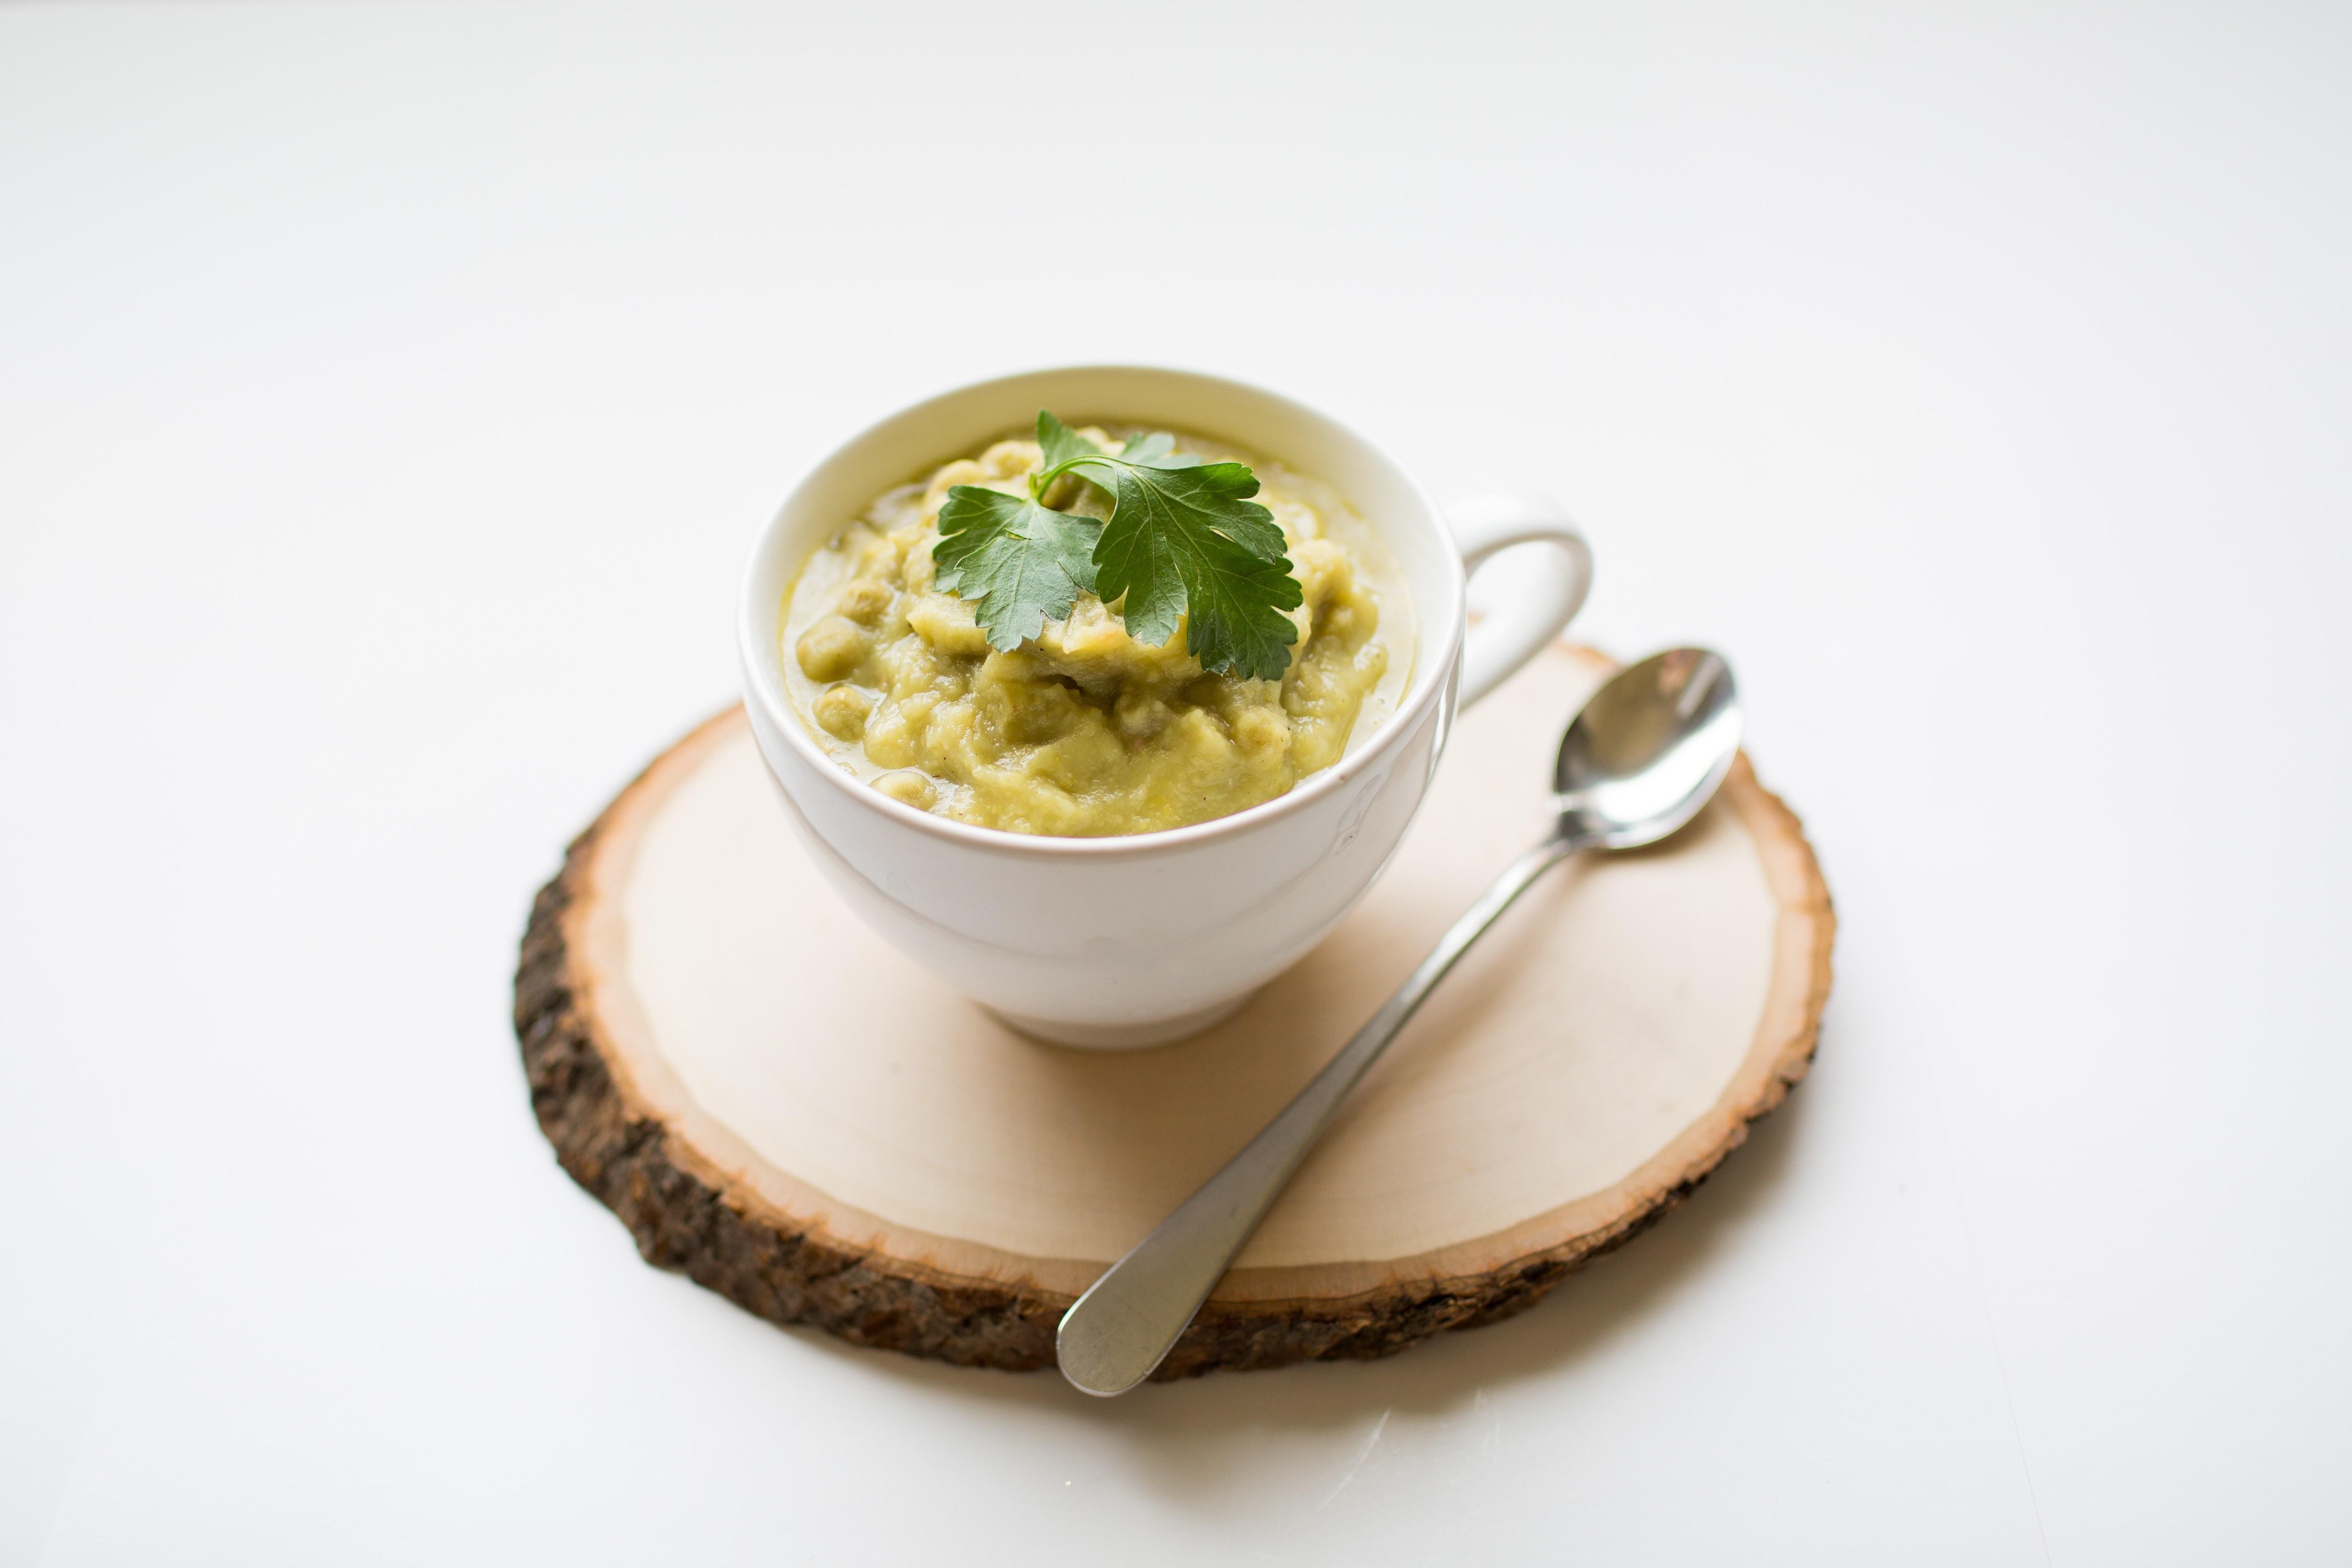 Hearty Green Pea Soup